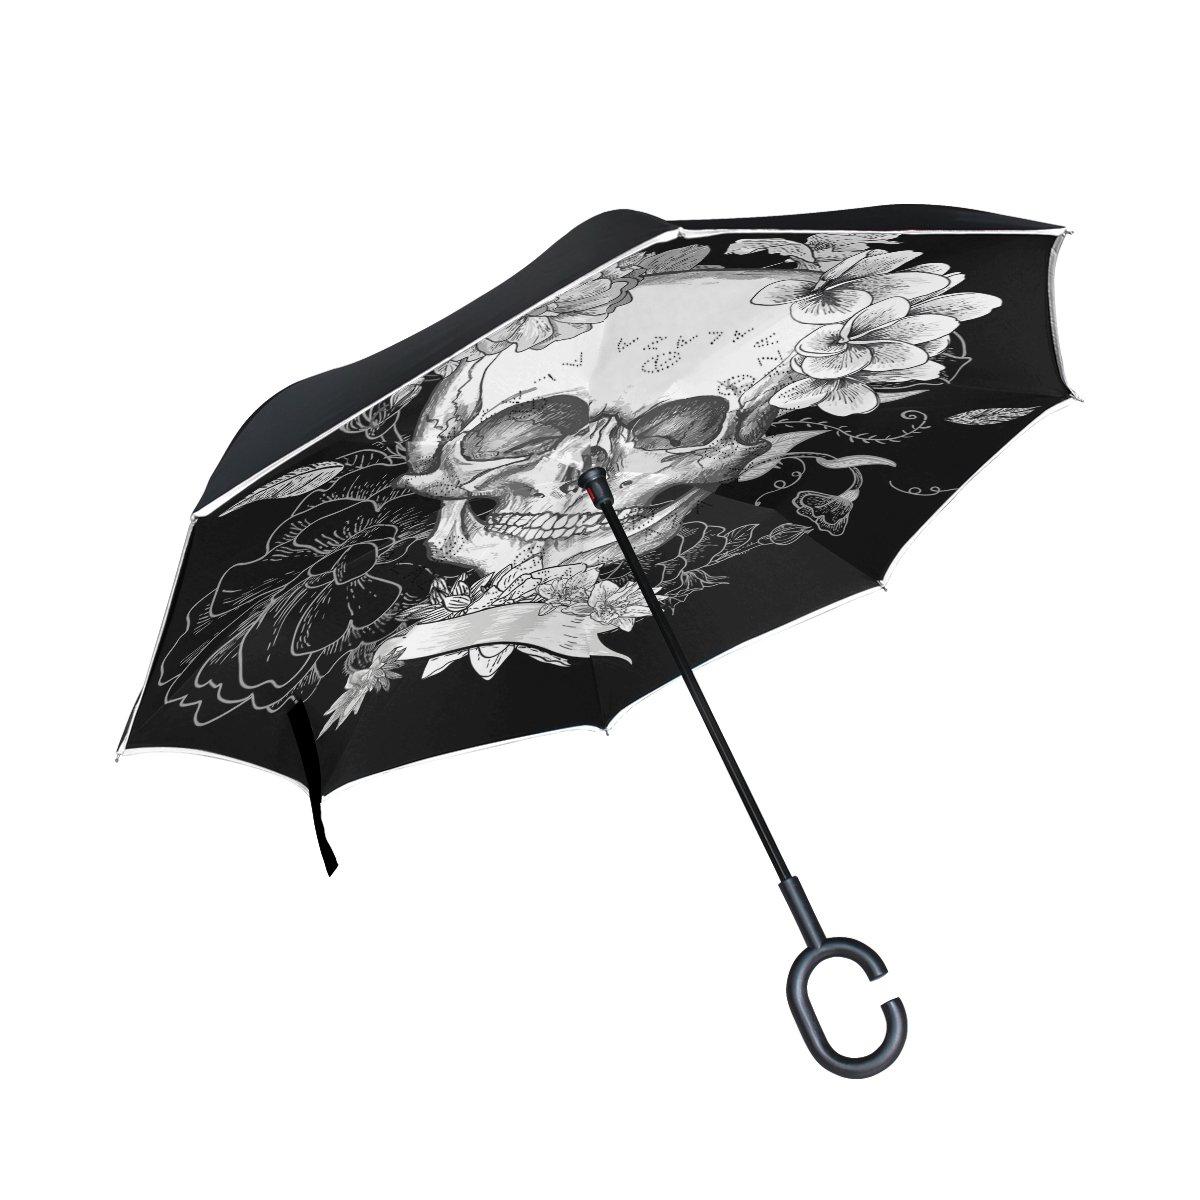 Grateful Dead Auto Foldable Windproof Rain Umbrella